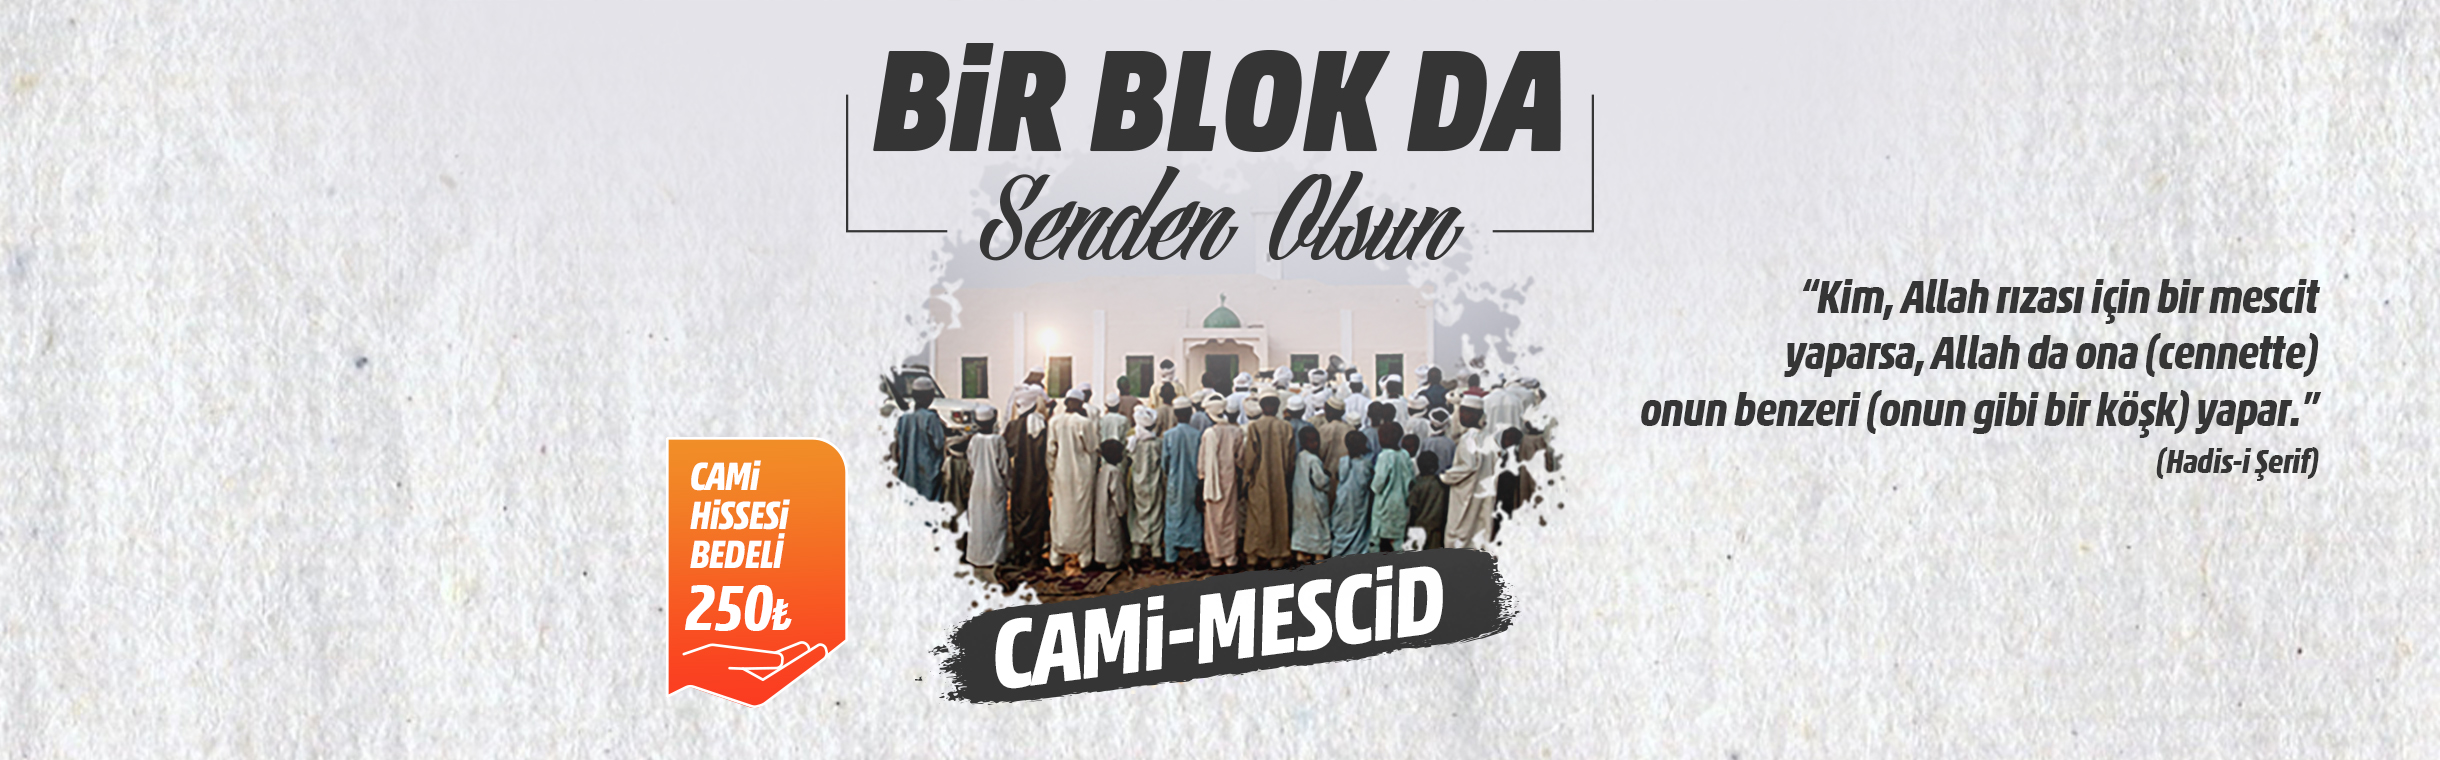 Cami Mescit